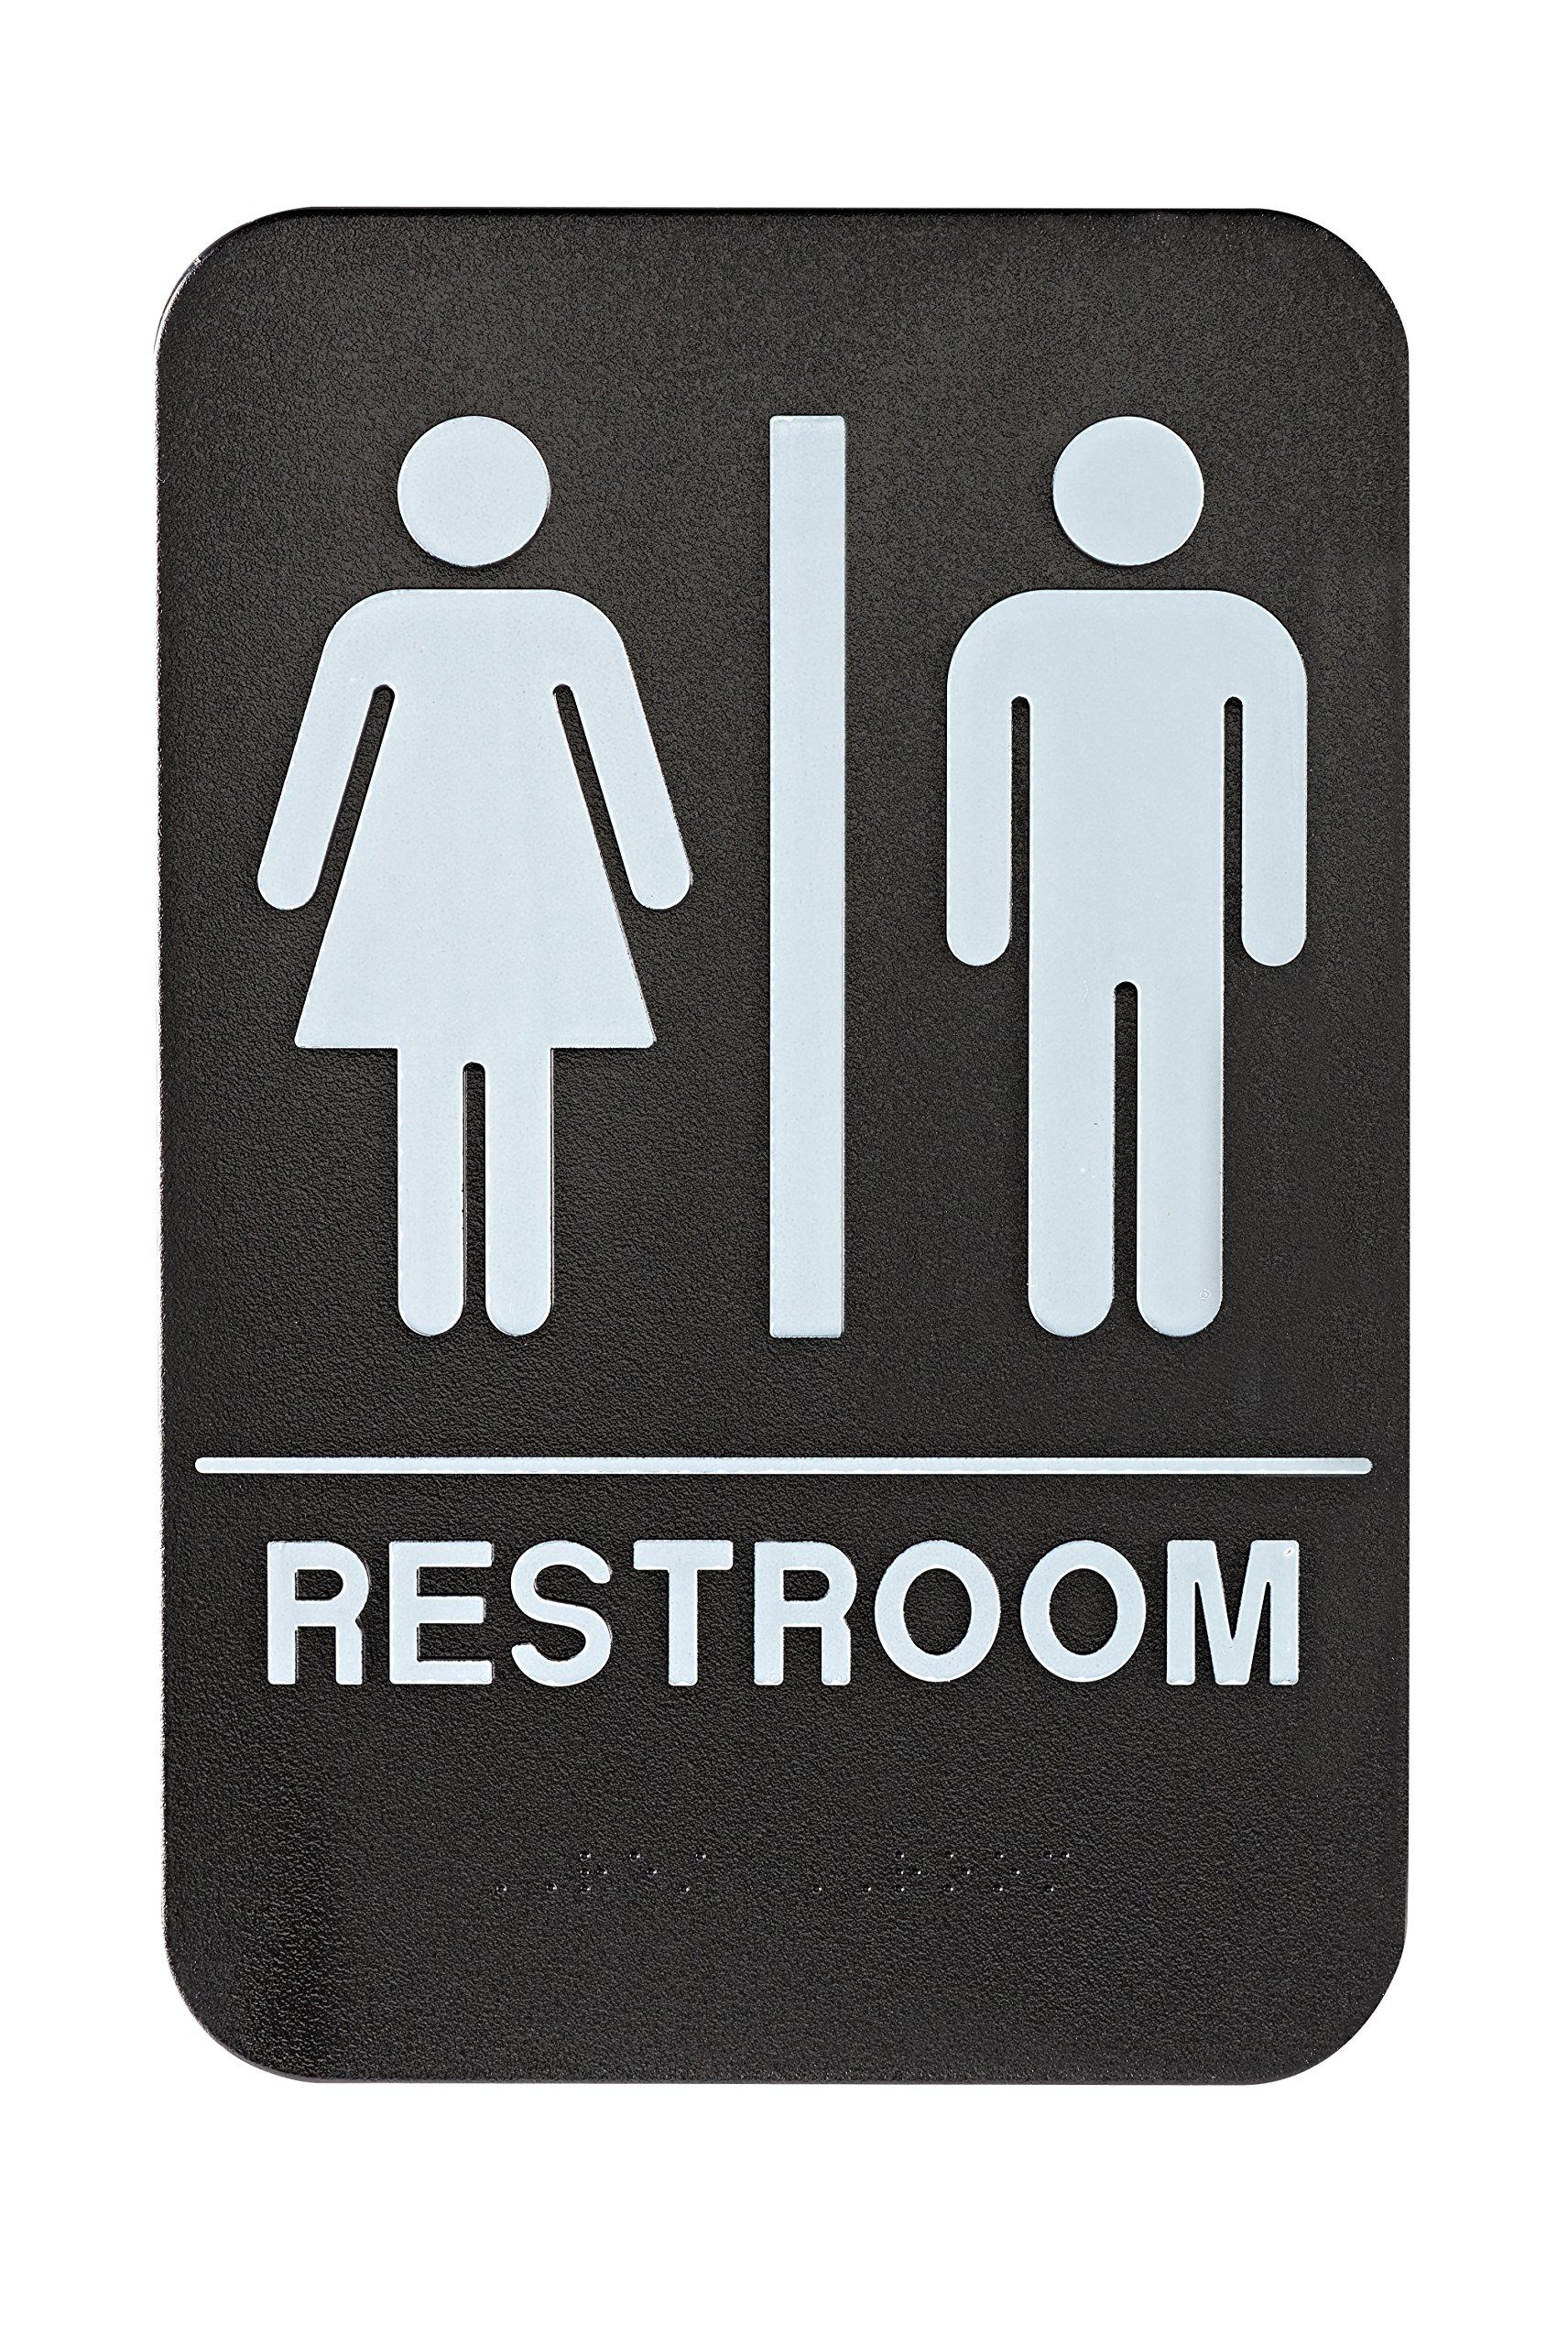 Alpine Industries Unisex Bathroom Restroom Sign, Black/White, ADA Compliant 6''x9''